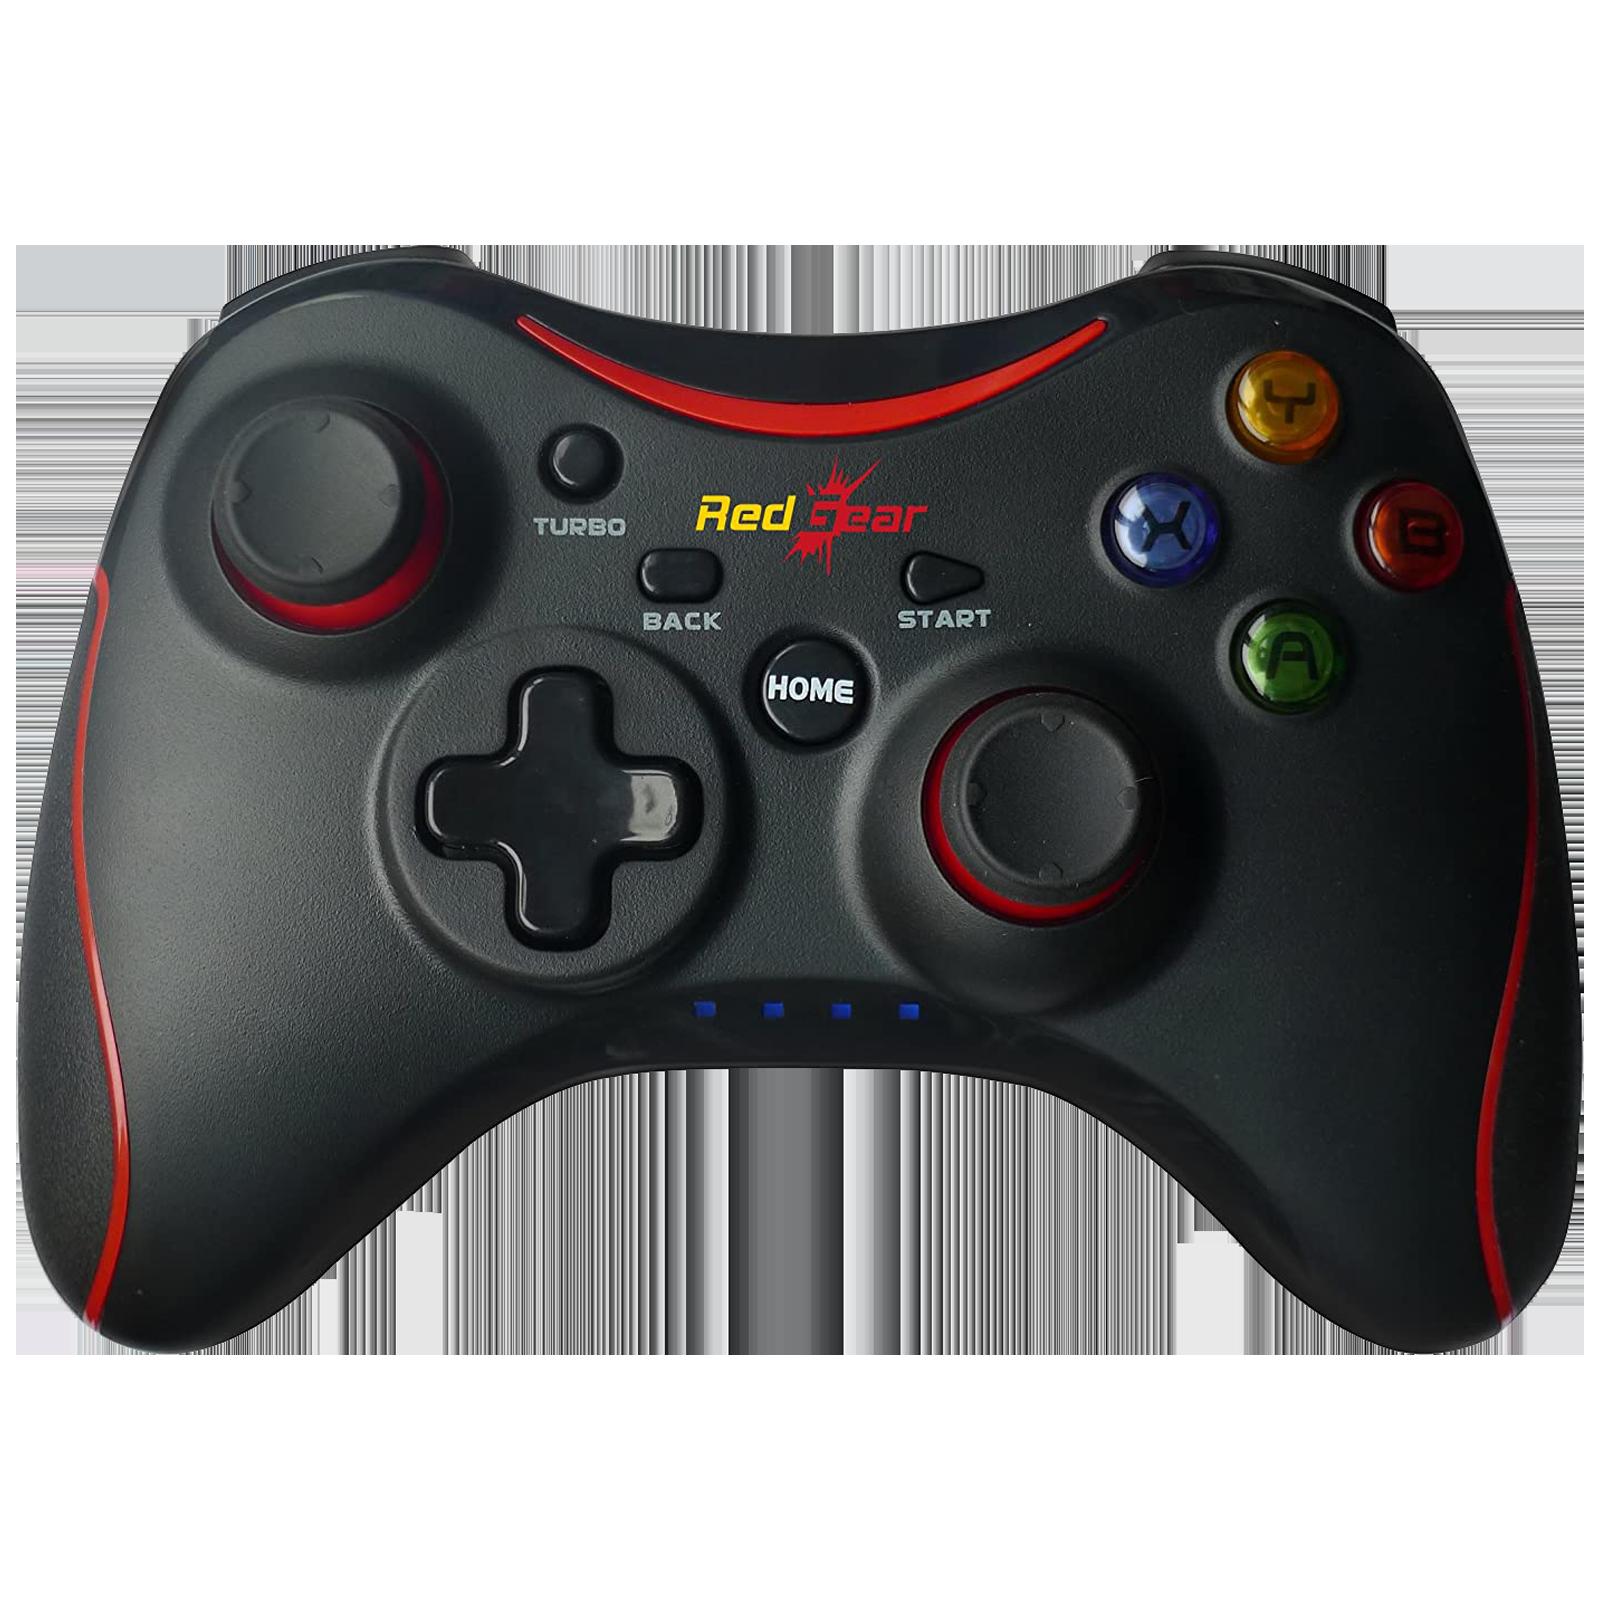 Redgear Pro Wireless Controller for PC (Dual High Intensity Motors, 8904130841989, Black)_1